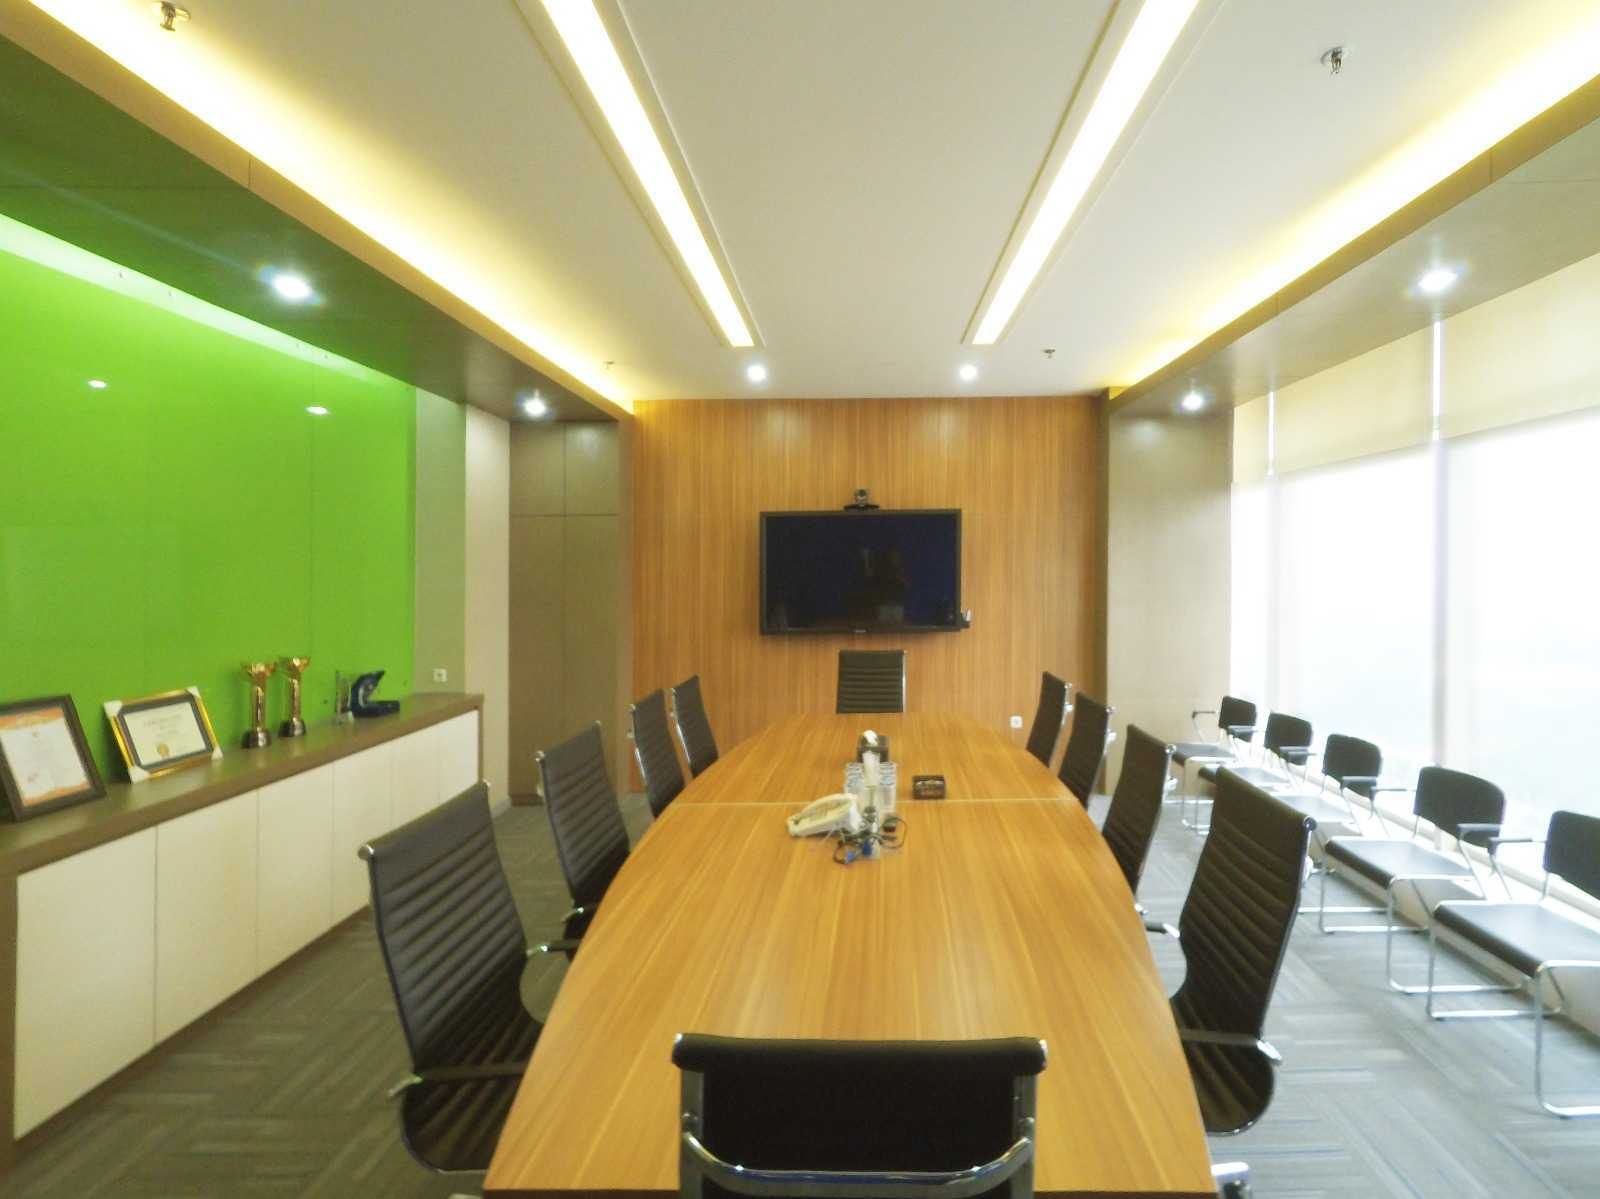 Arkadia Works Sekar Bumi Office Renovation Plaza Asia 21St Floor Plaza Asia 21St Floor Meeting Room   14078